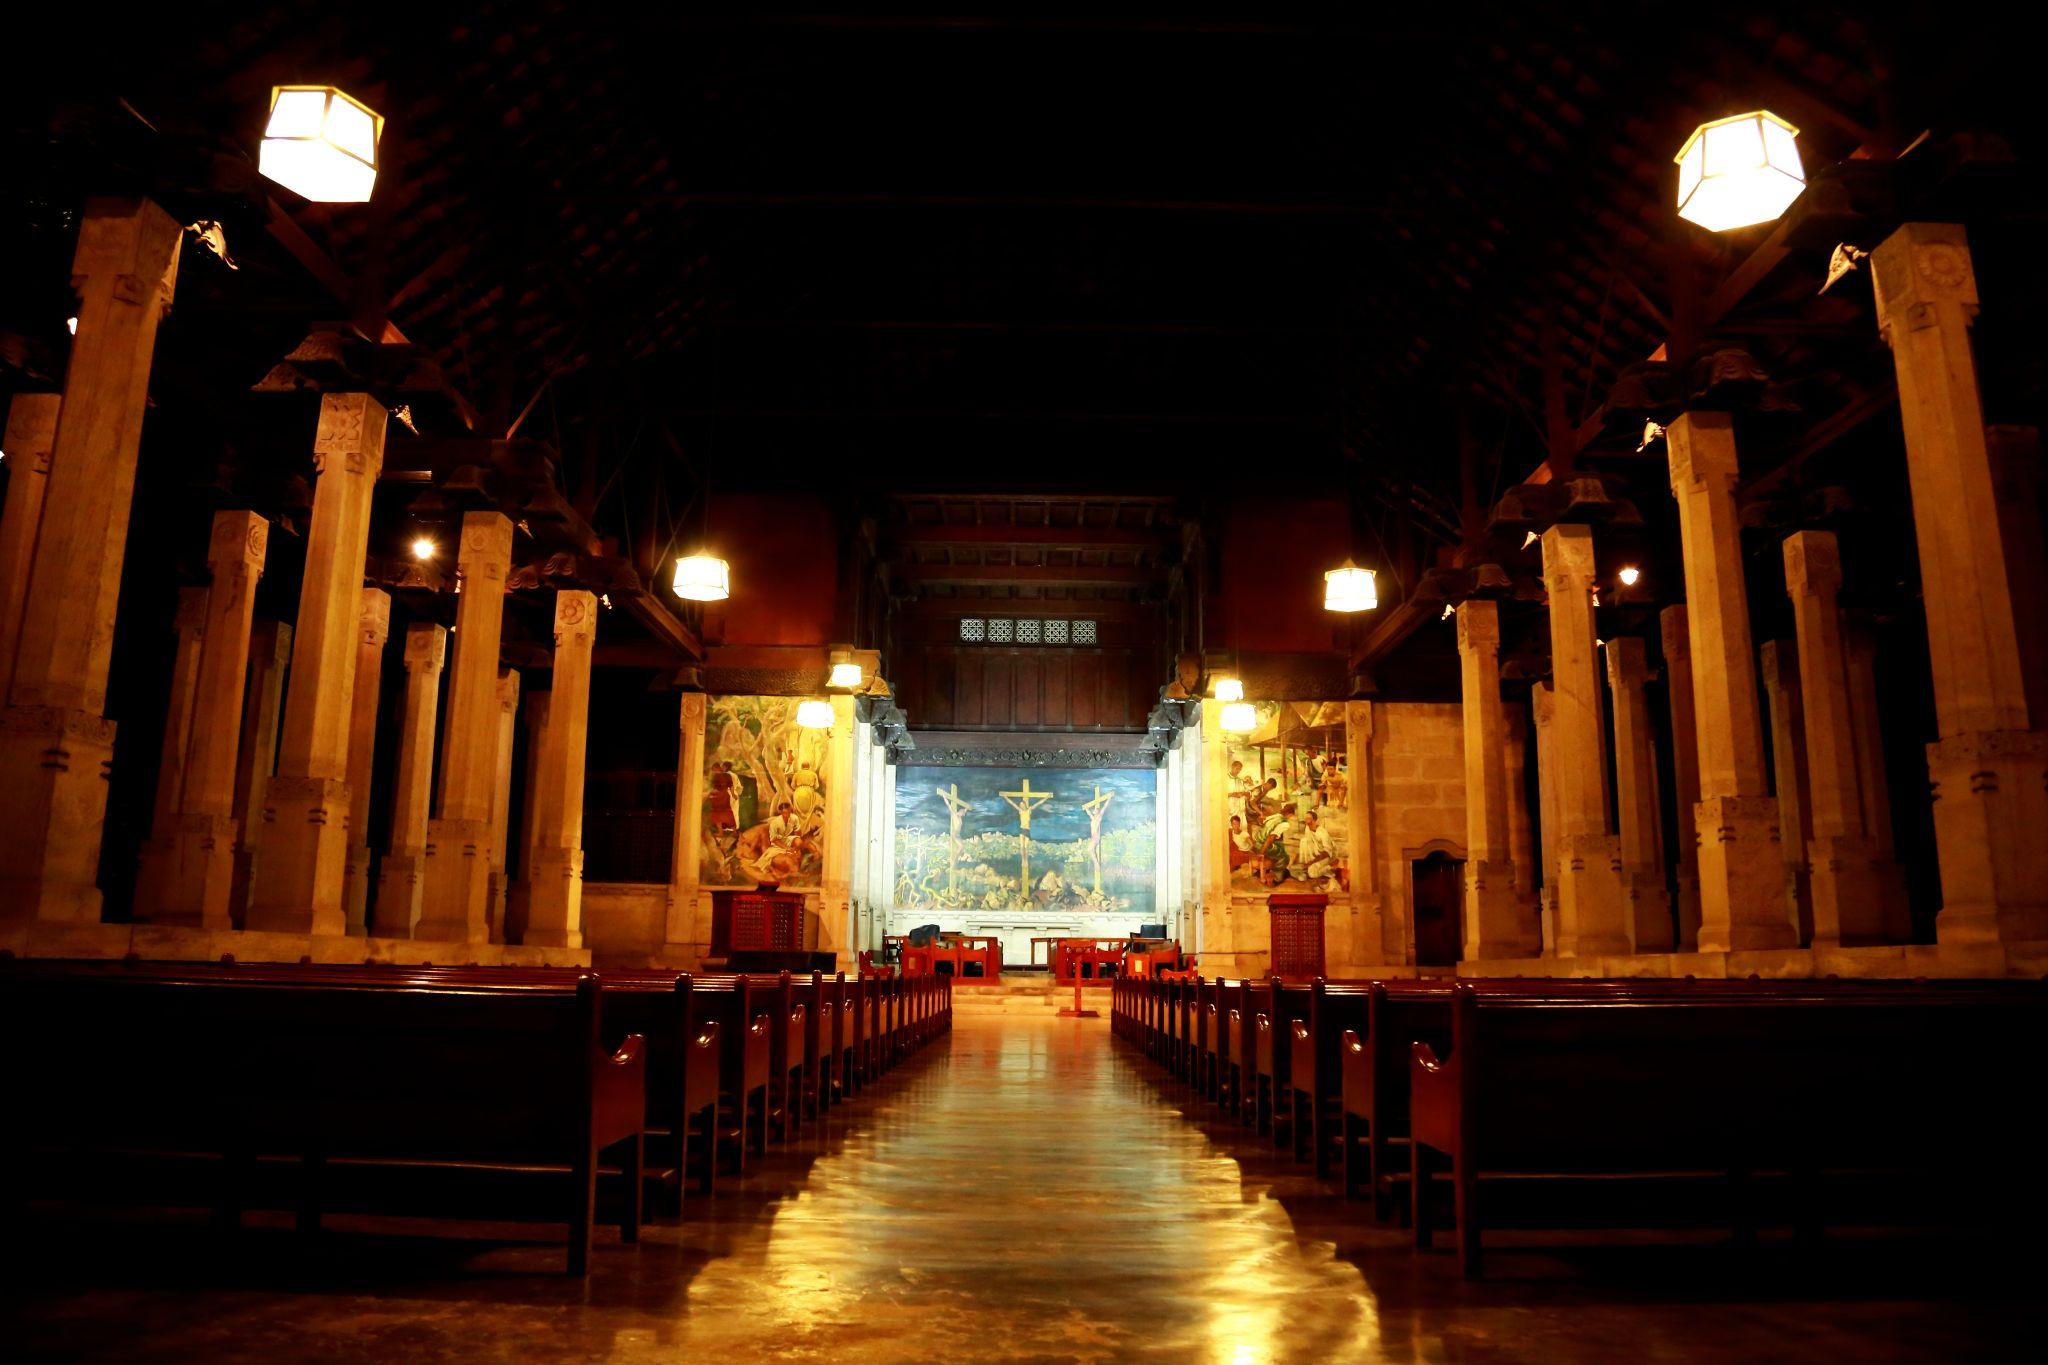 Trinity College Chapel at night